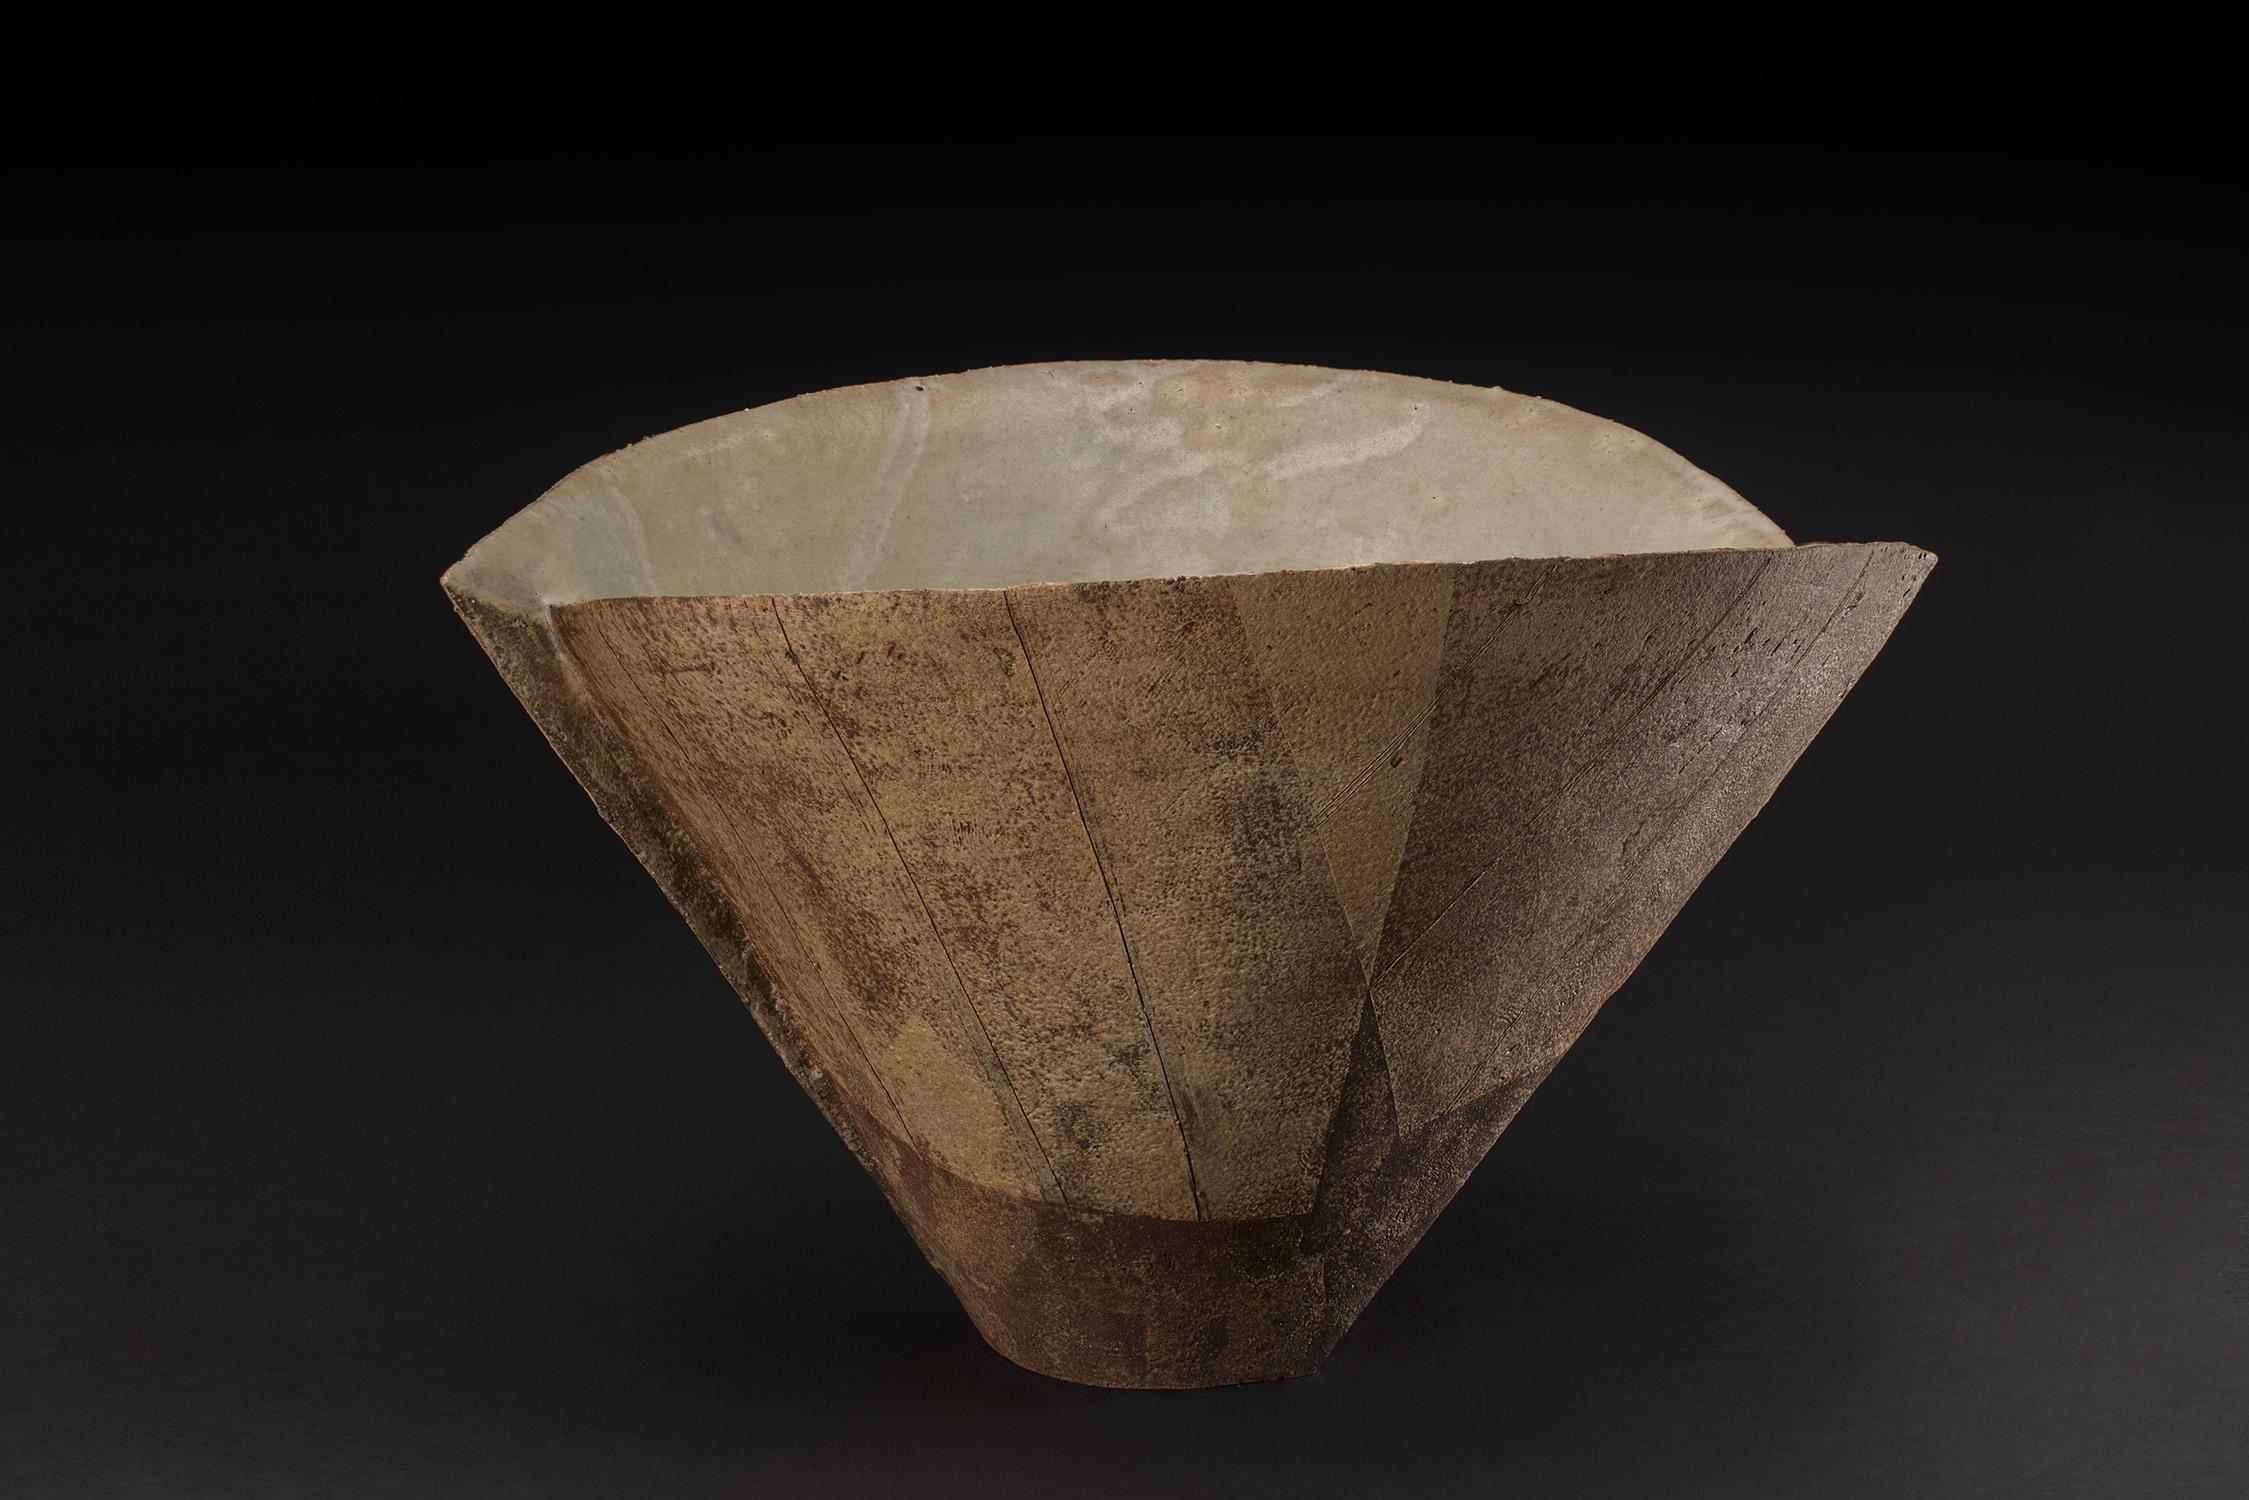 Keiichi Shimizu  Bowl  , 2018 Hand built porcelain, white mud glaze 9.5 x 15.5 x 13 inches 24.1 x 39.4 x 33 cm KSh 7